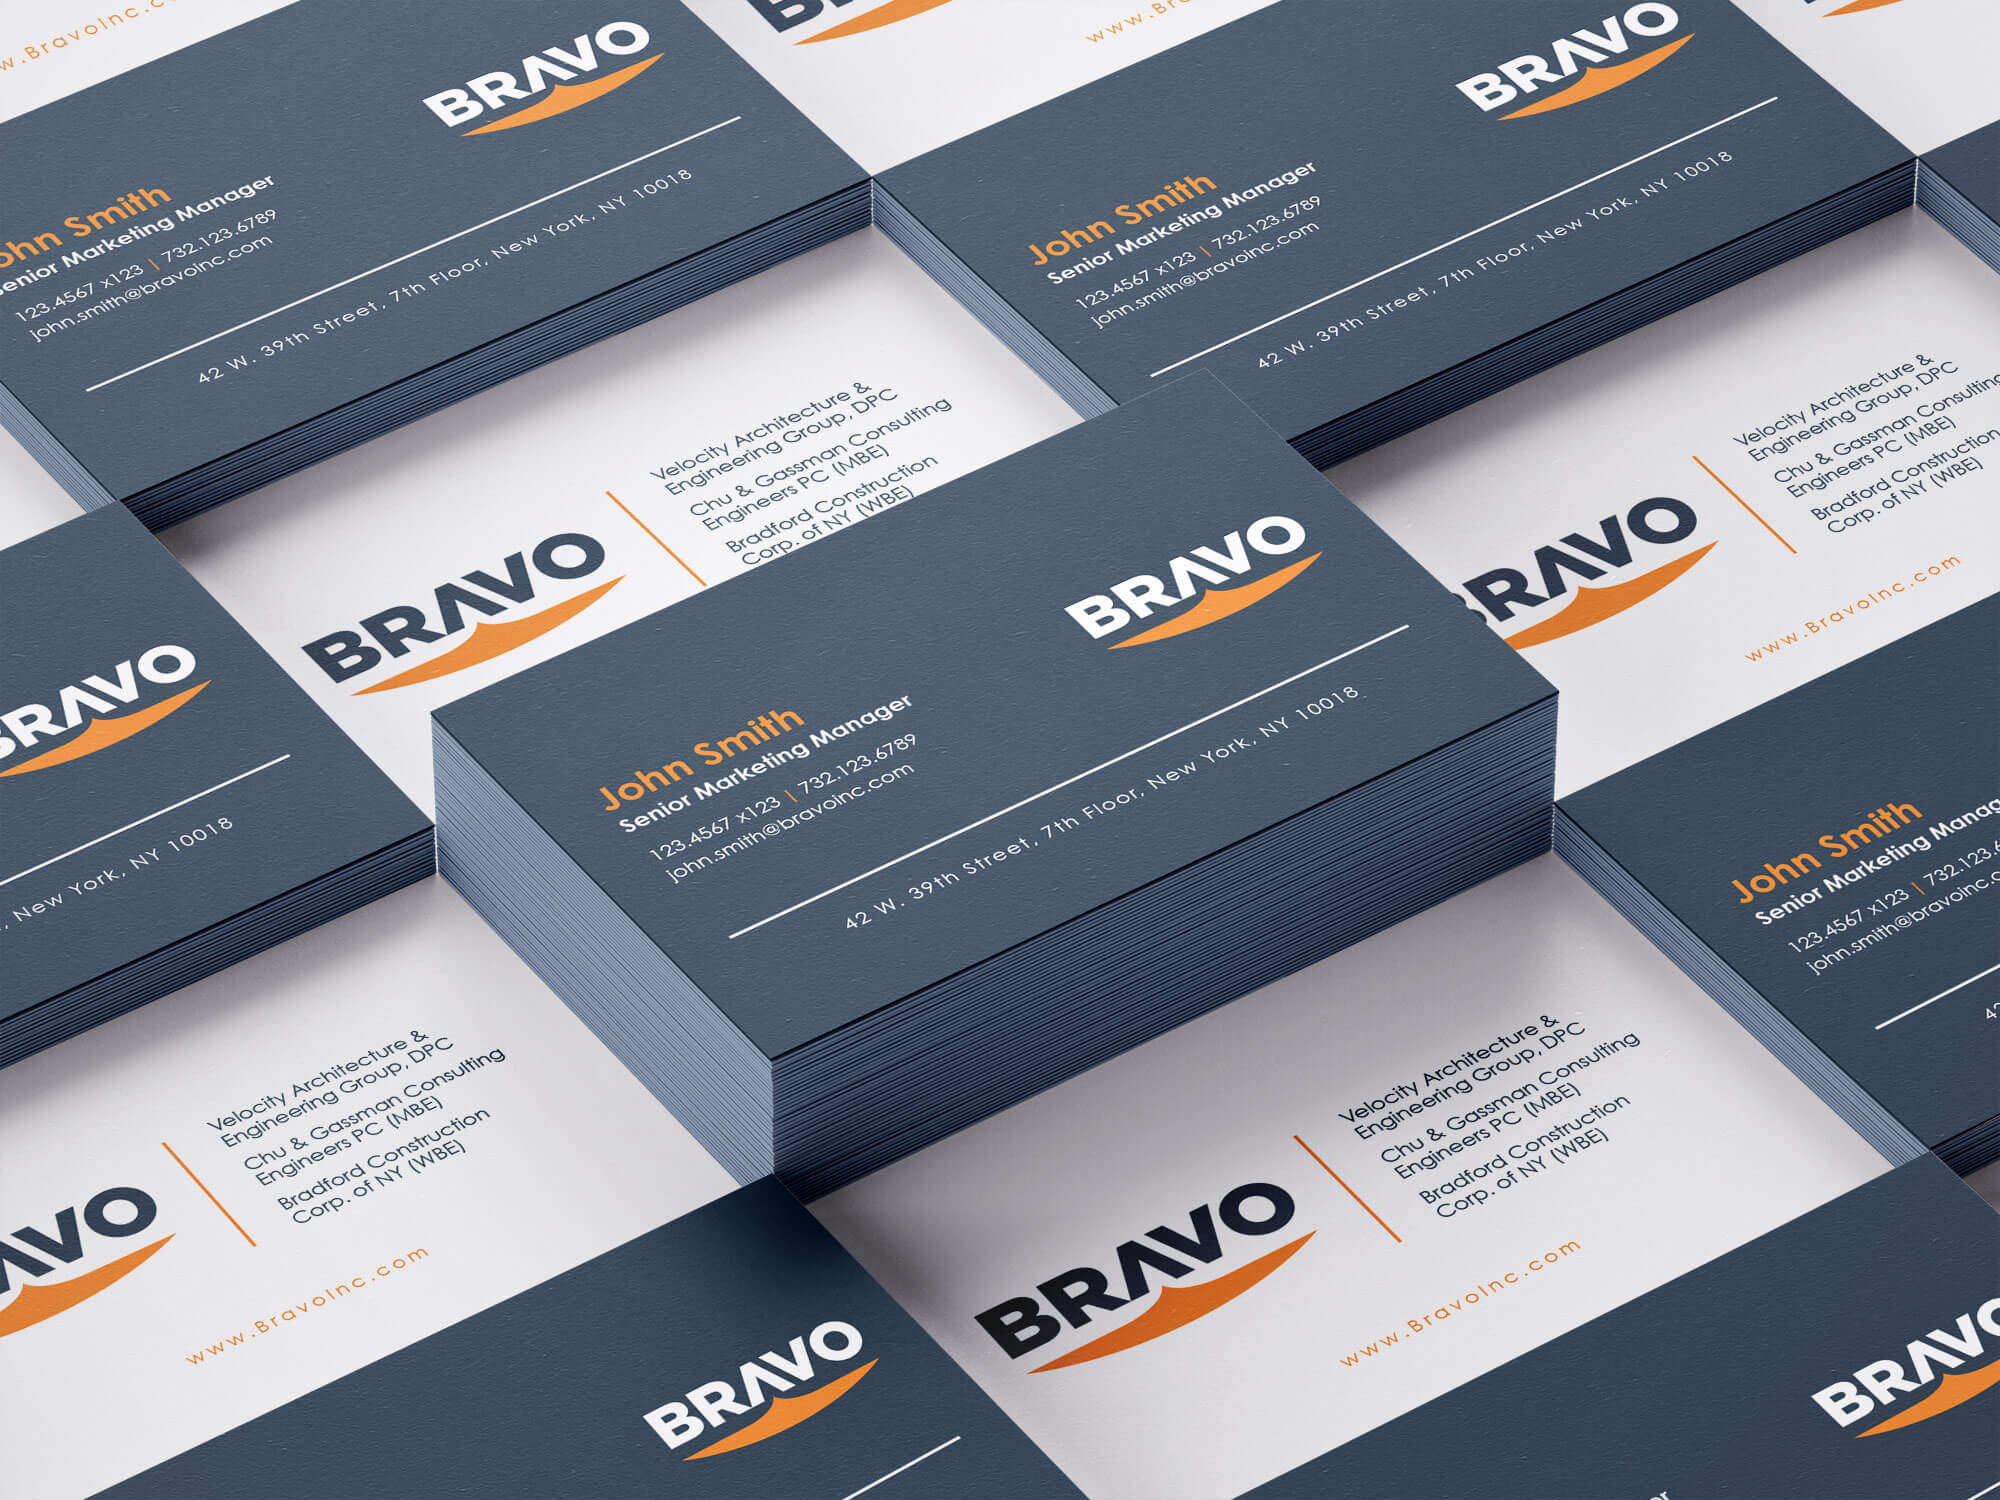 Bravo Branding